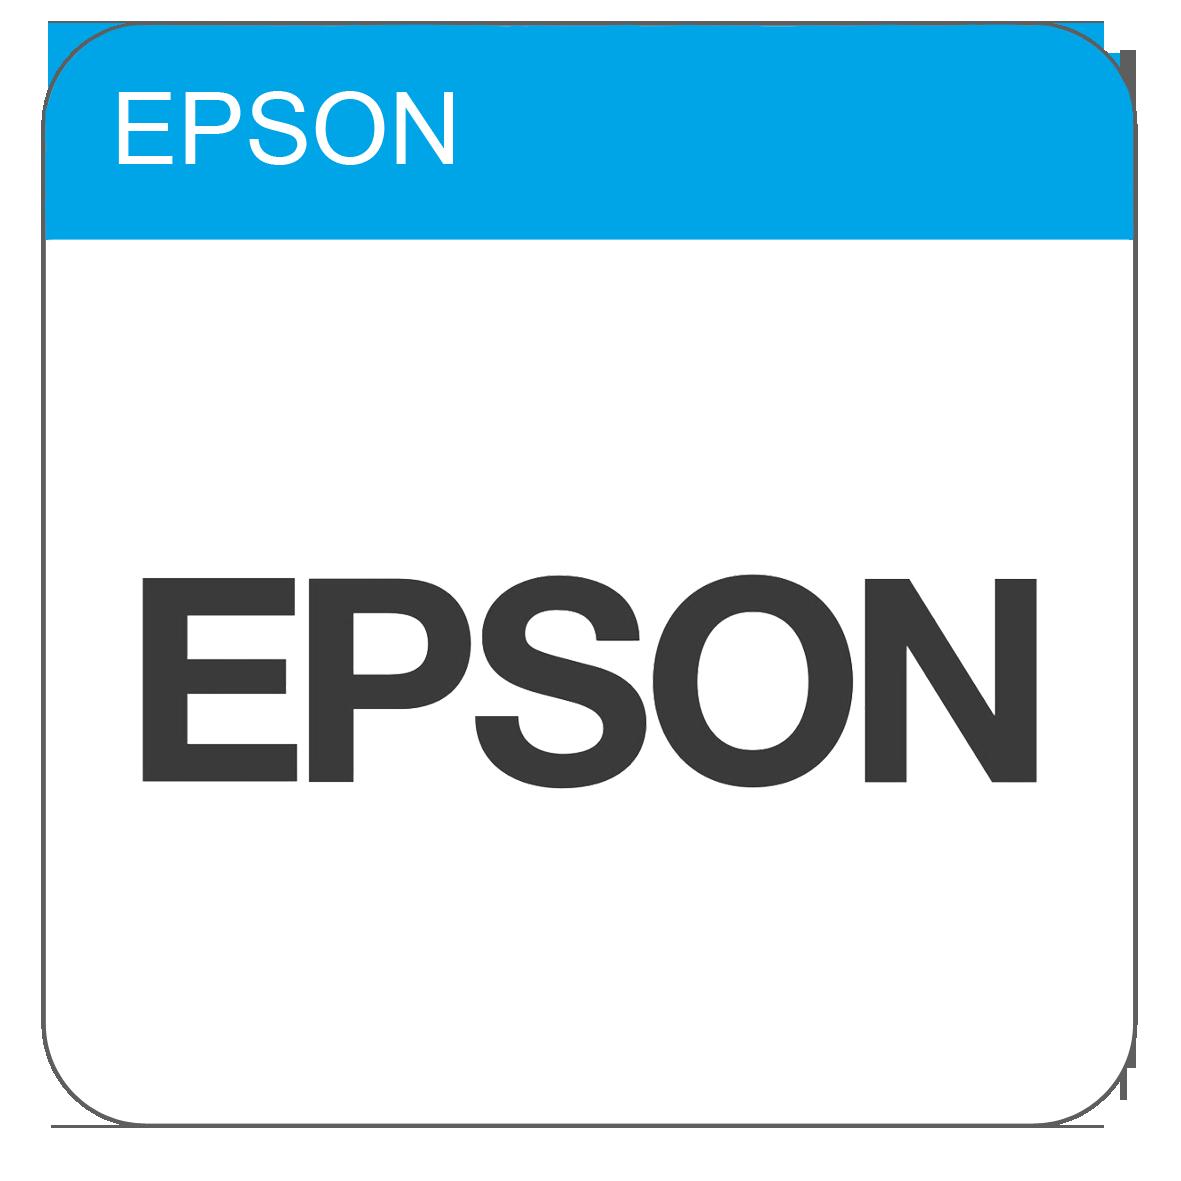 Epson Drivers & Handleidingen